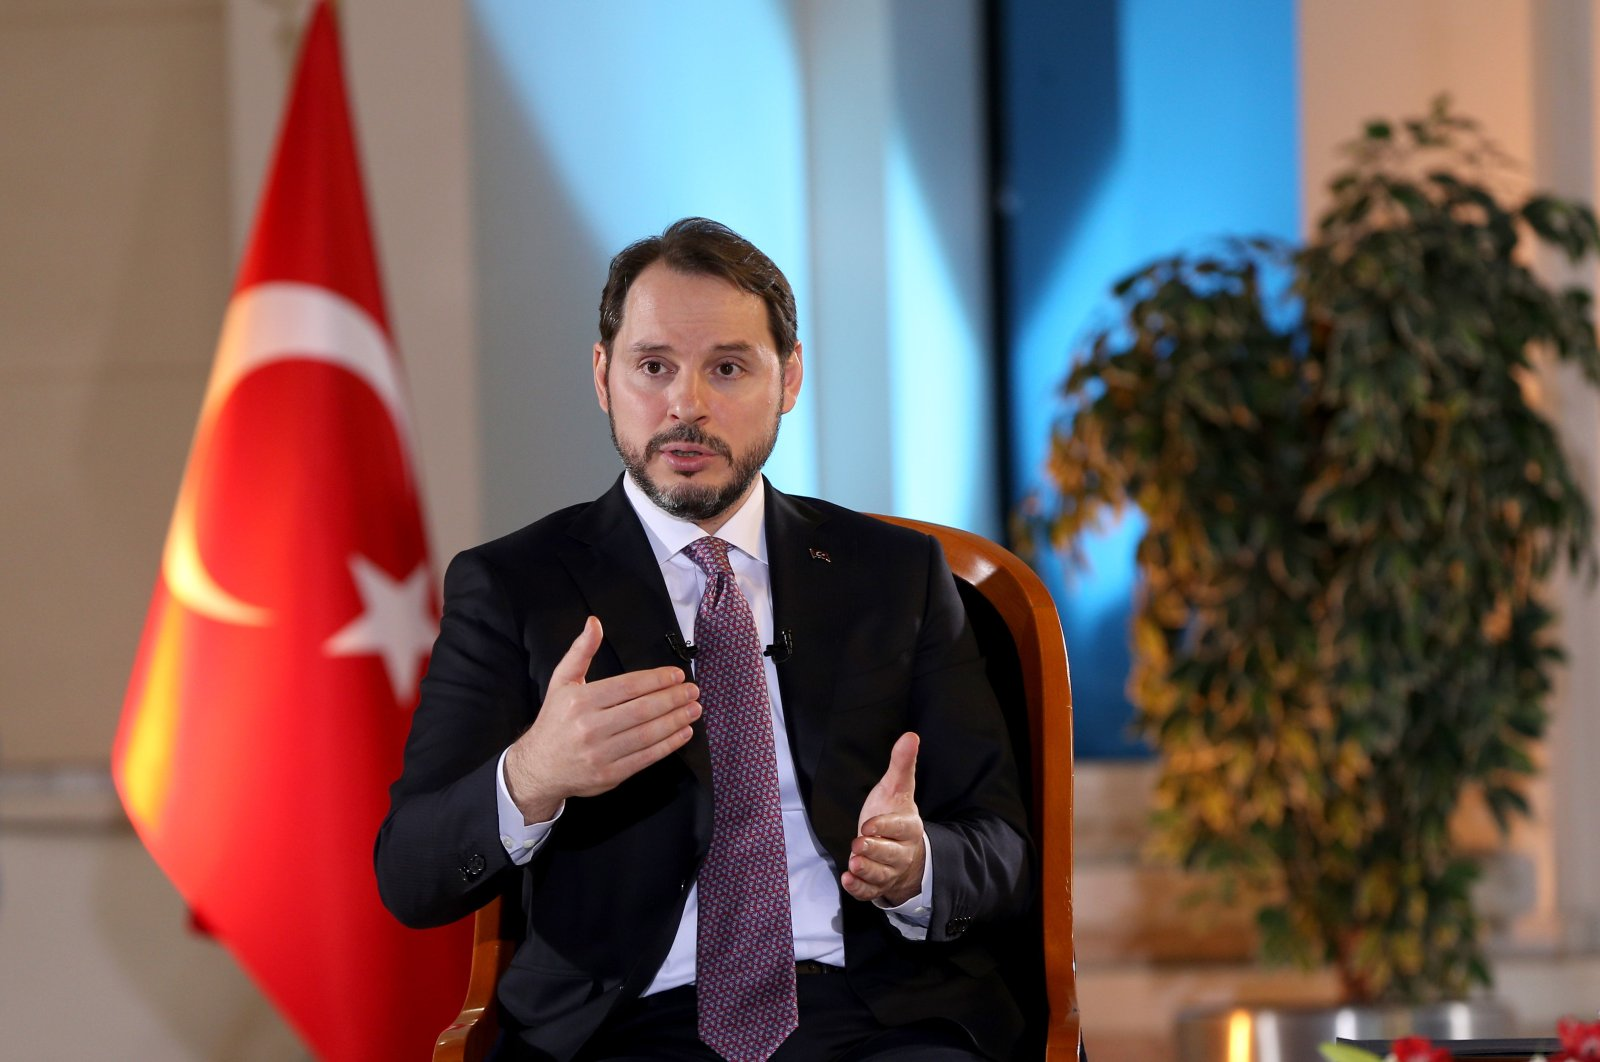 Treasury and Finance Minister Berat Albayrak speaks on an Anadolu Agency broadcast, March 20, 2020. (AA Photo)